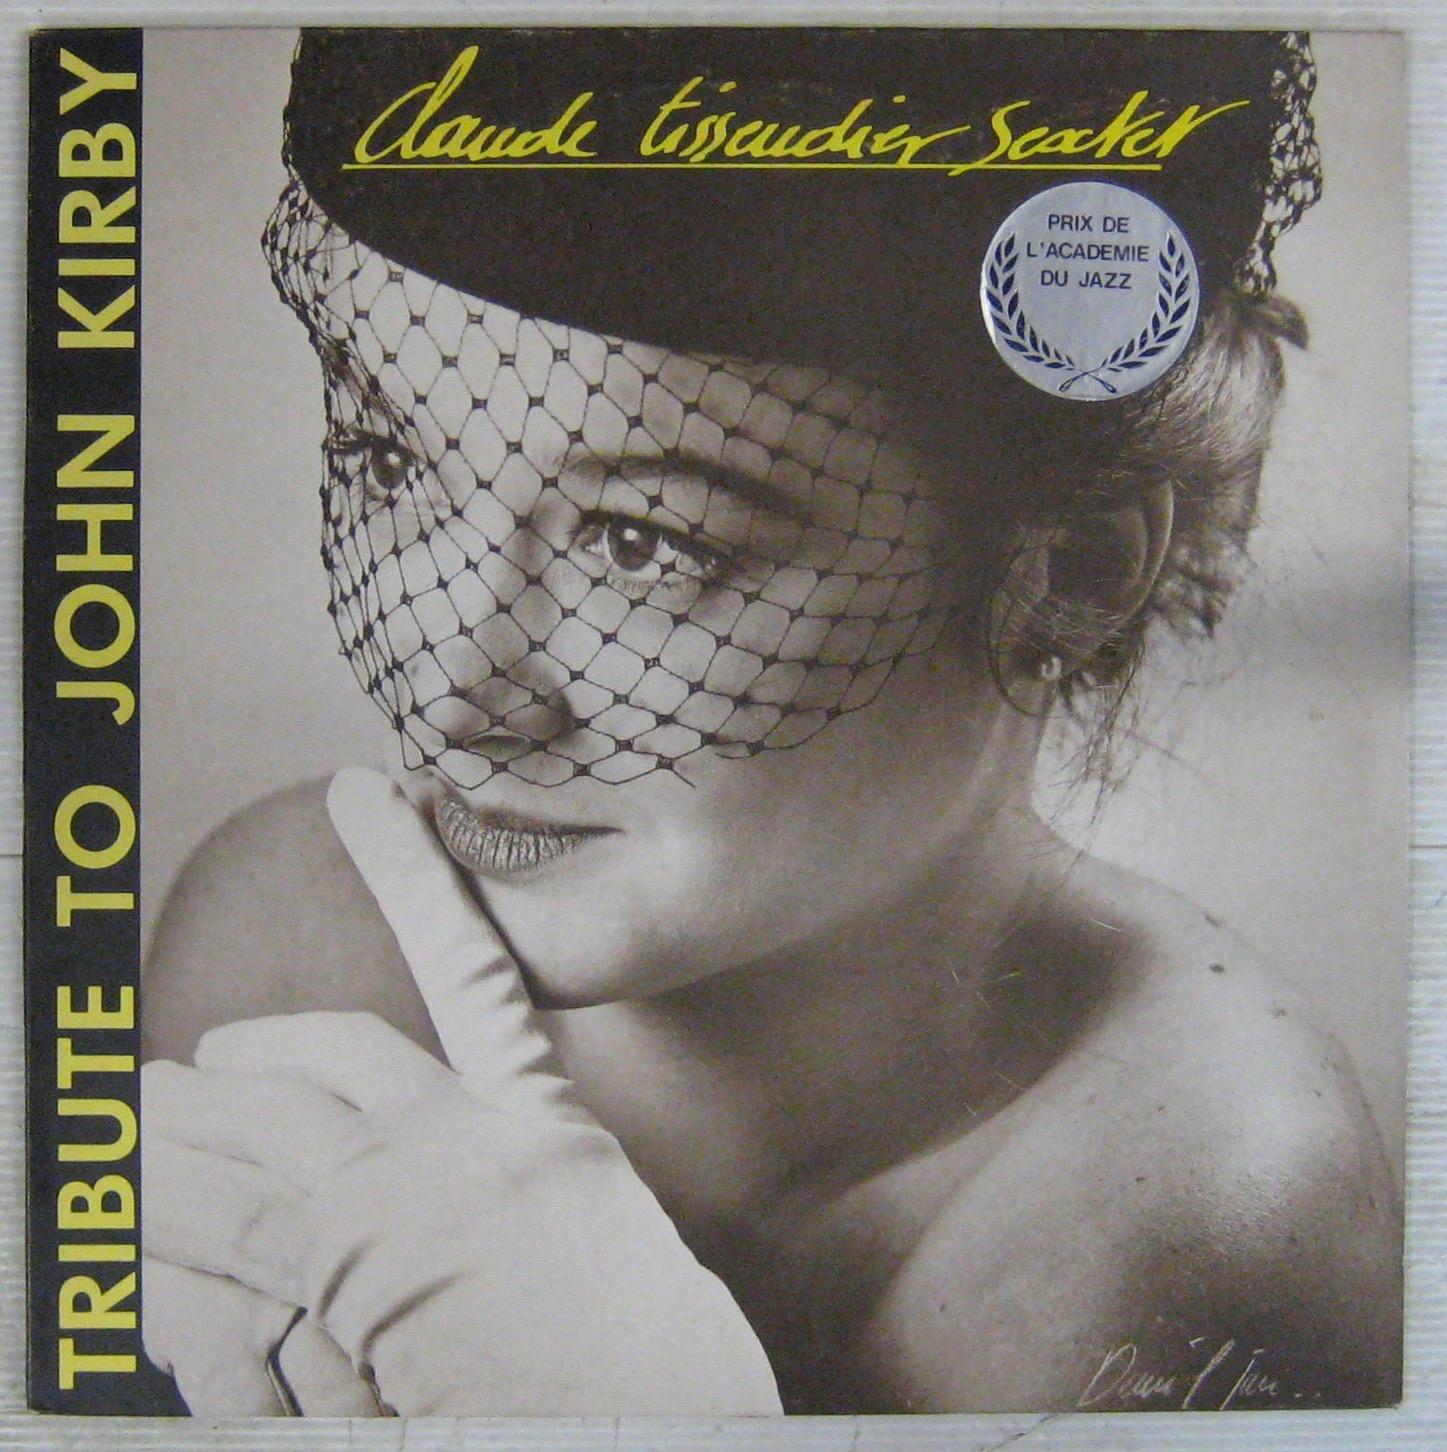 CLAUDE TISSENDIER QUARTET - Tribute to John Kirby - LP